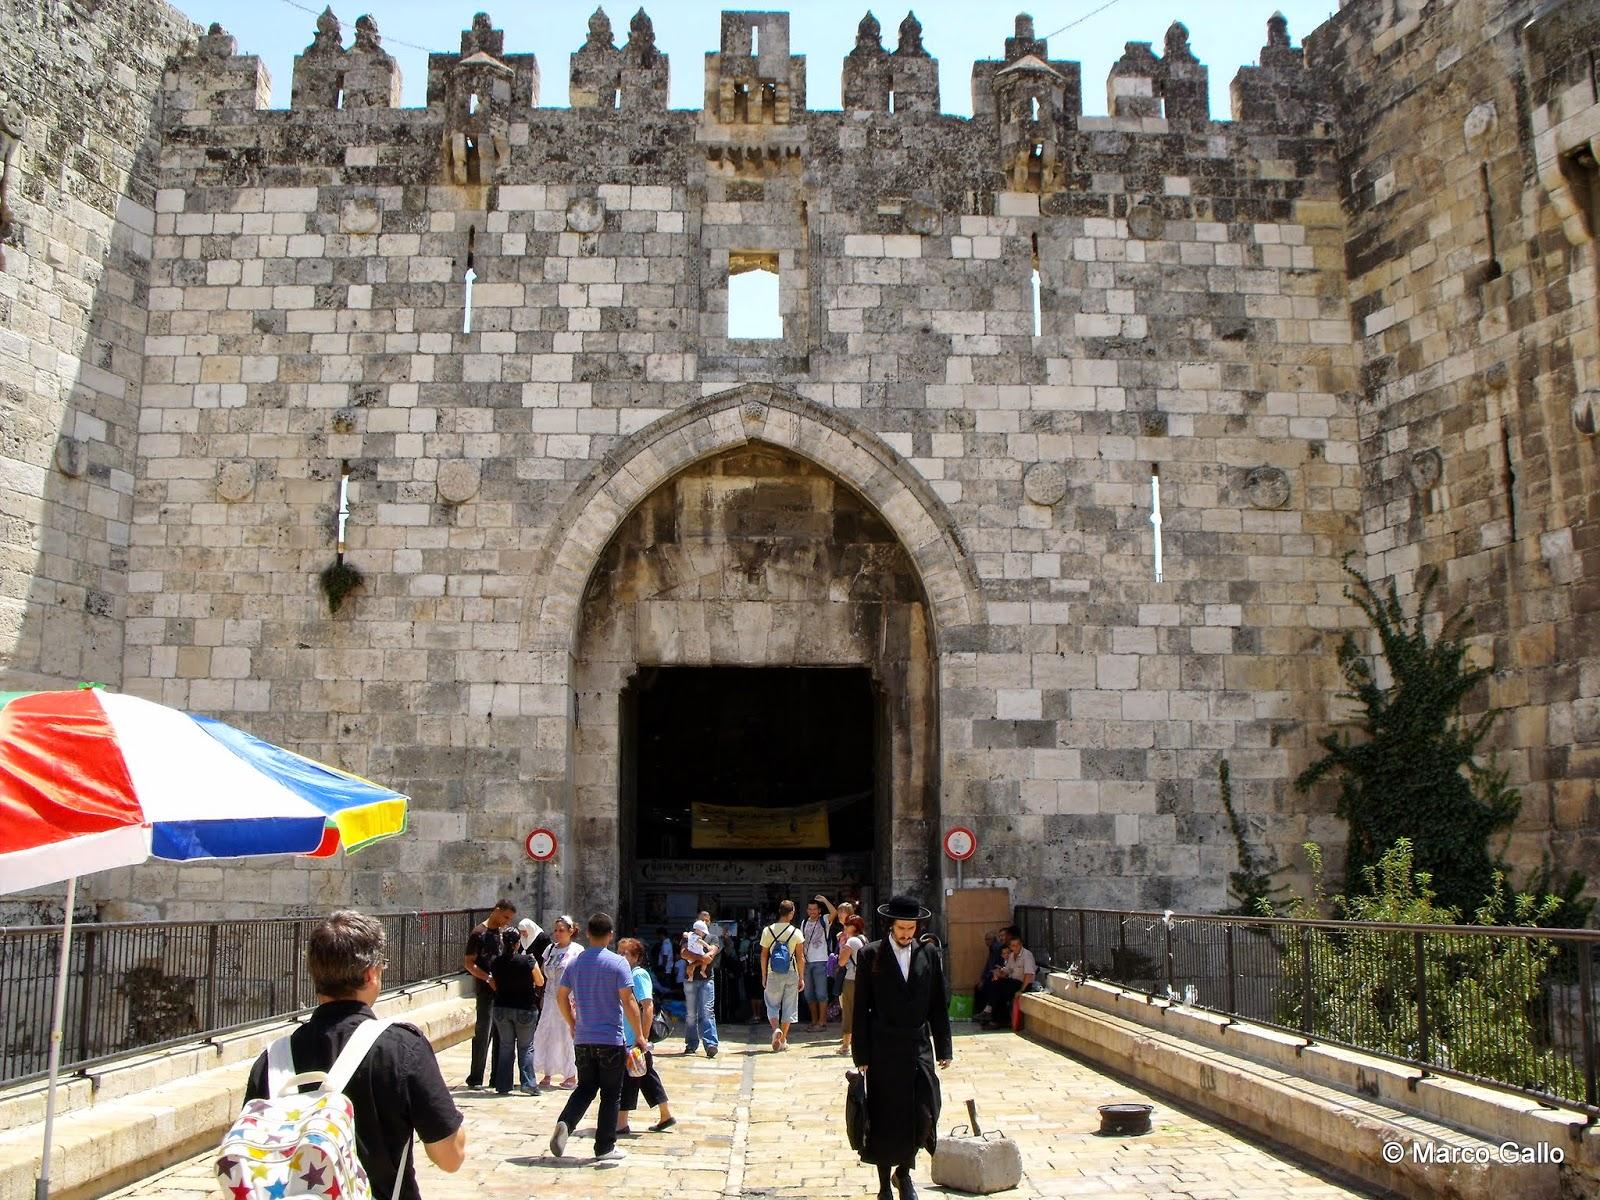 Vivir viajando puerta de damasco jerusal n israel - Fotos de damasco ...